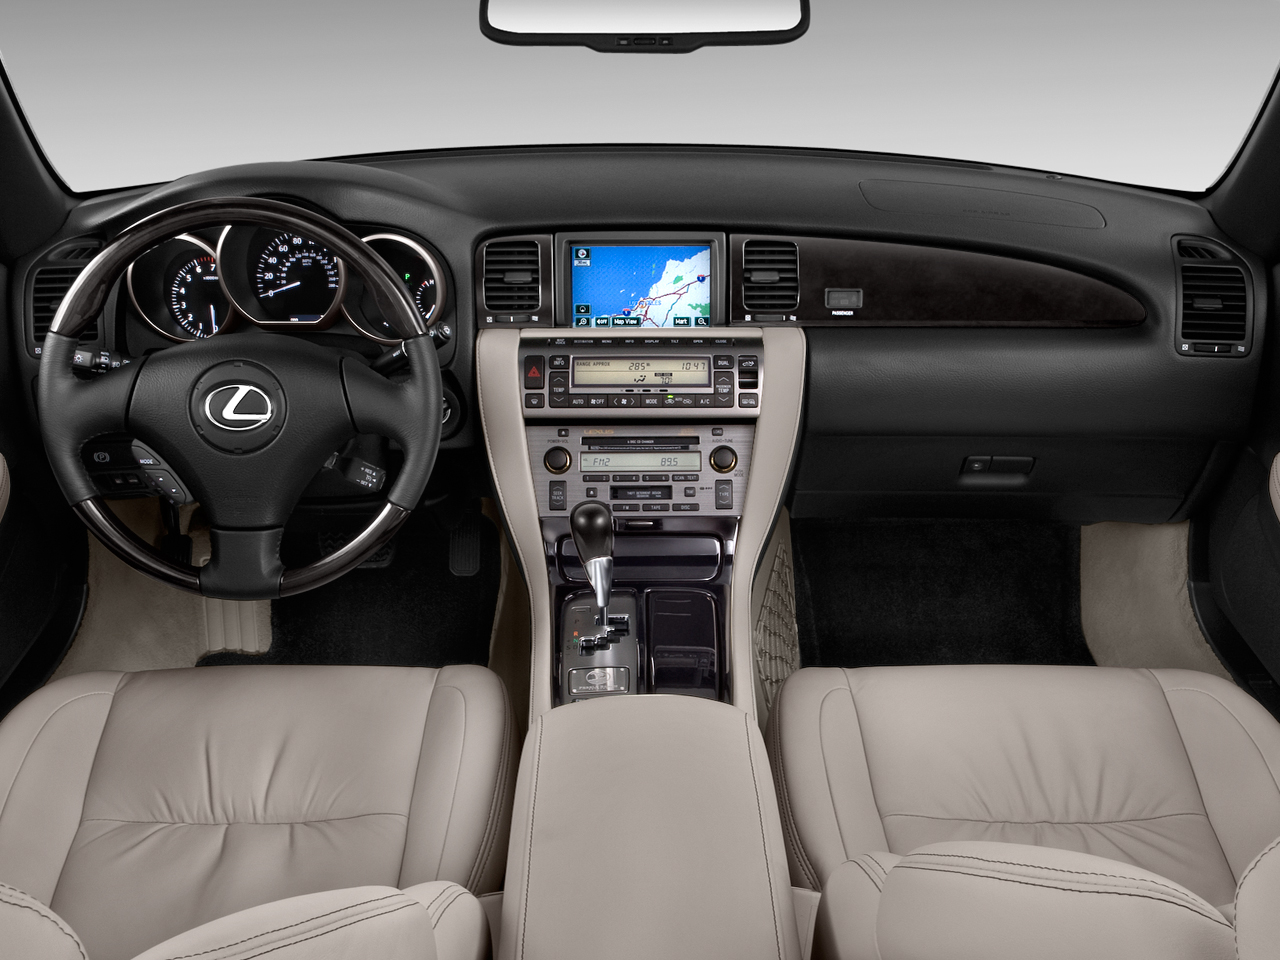 Car Site, News Car, Review Car, Picture and More: Lexus SC430